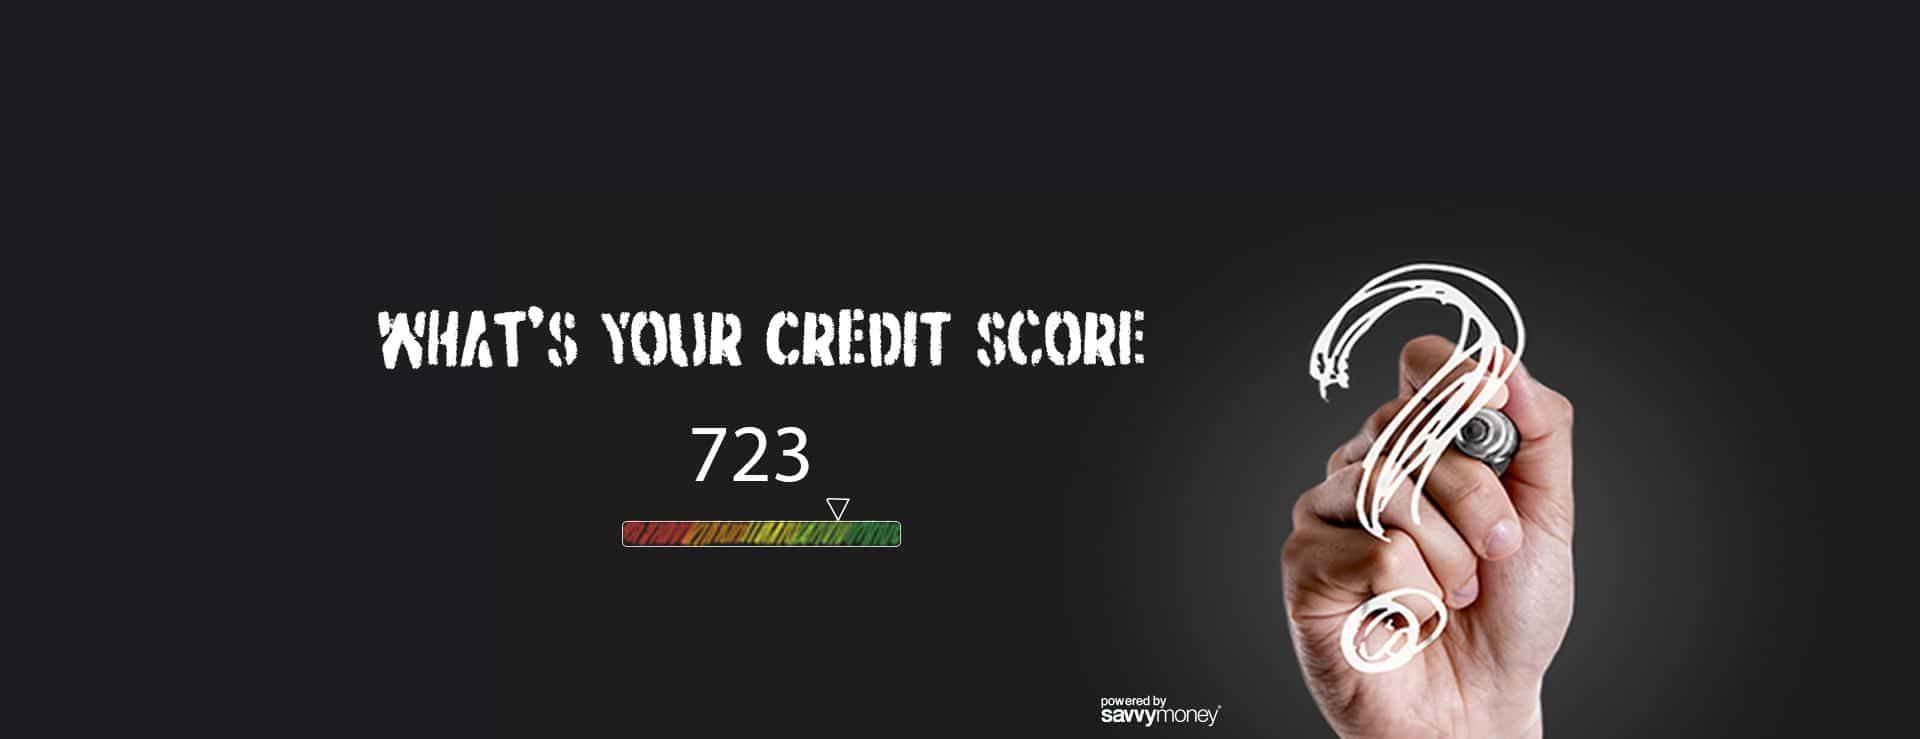 savvymoney-whats-your-score-banner-min